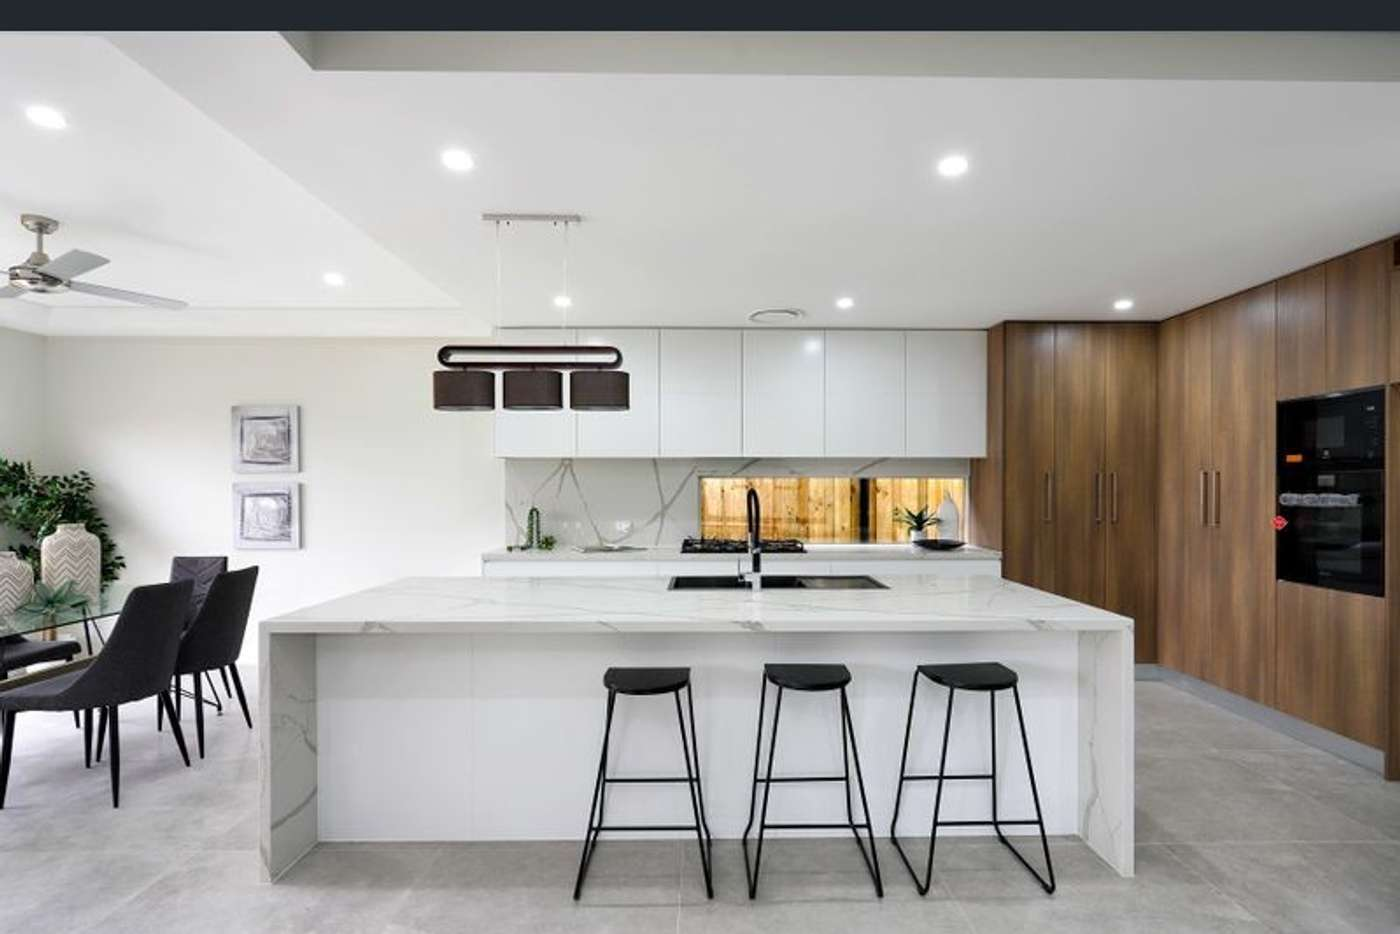 Main view of Homely house listing, 16 Batula Parade, Marsden Park NSW 2765